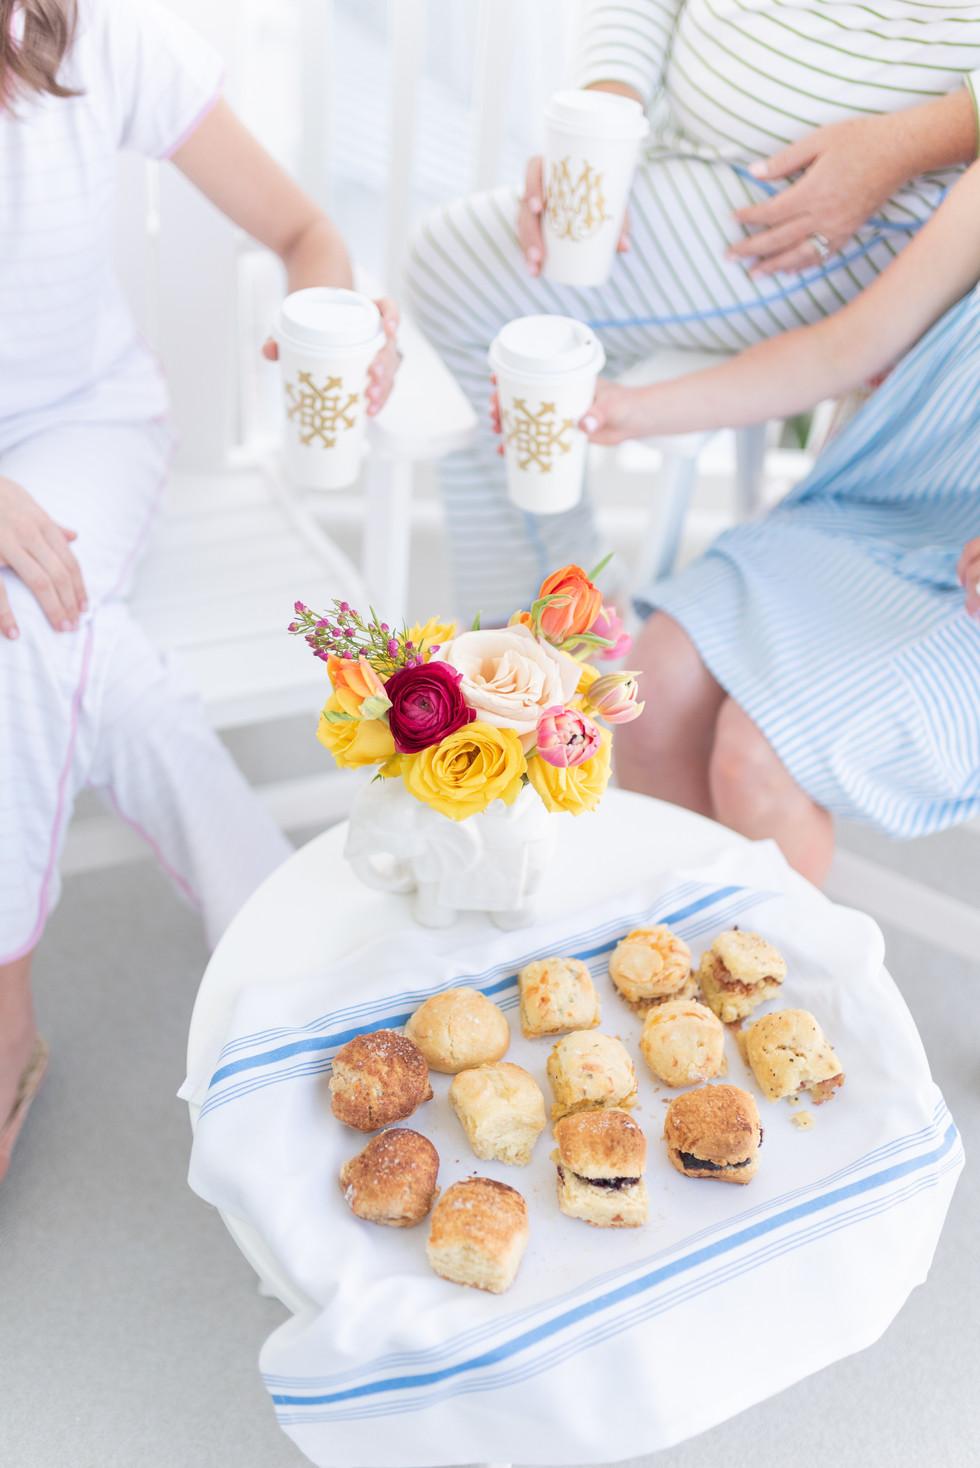 TSC-Ladies-Hotel-Callies-May-2019-38.jpg